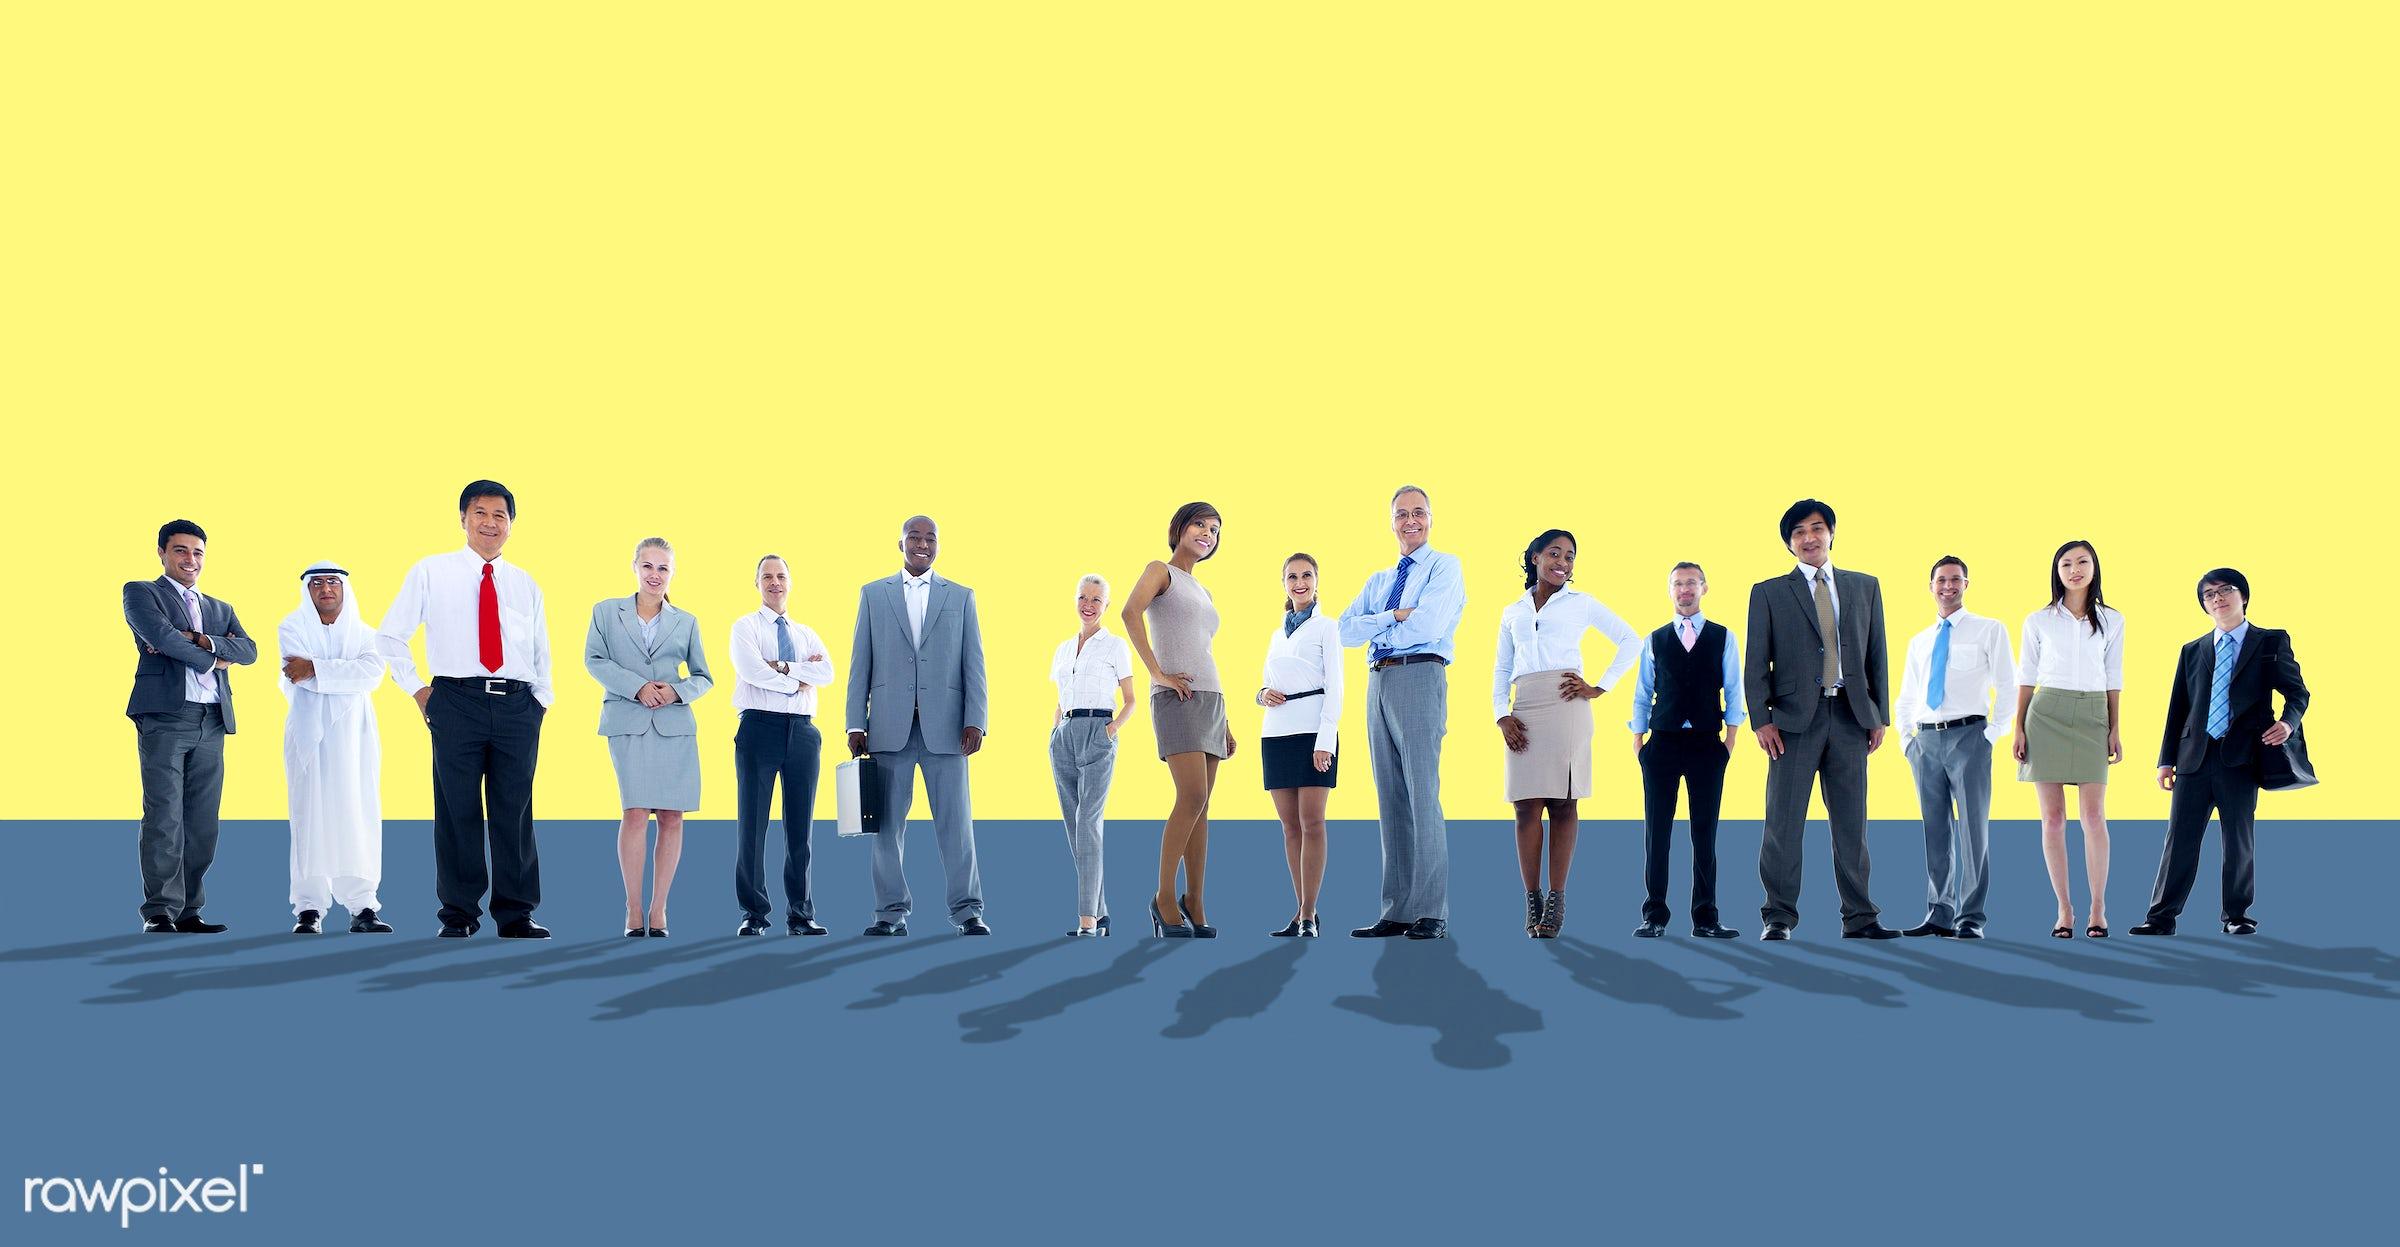 backdrop, background, blue, business, business people, businessmen, businesswomen, corporate, diverse, diversity, ethnic,...